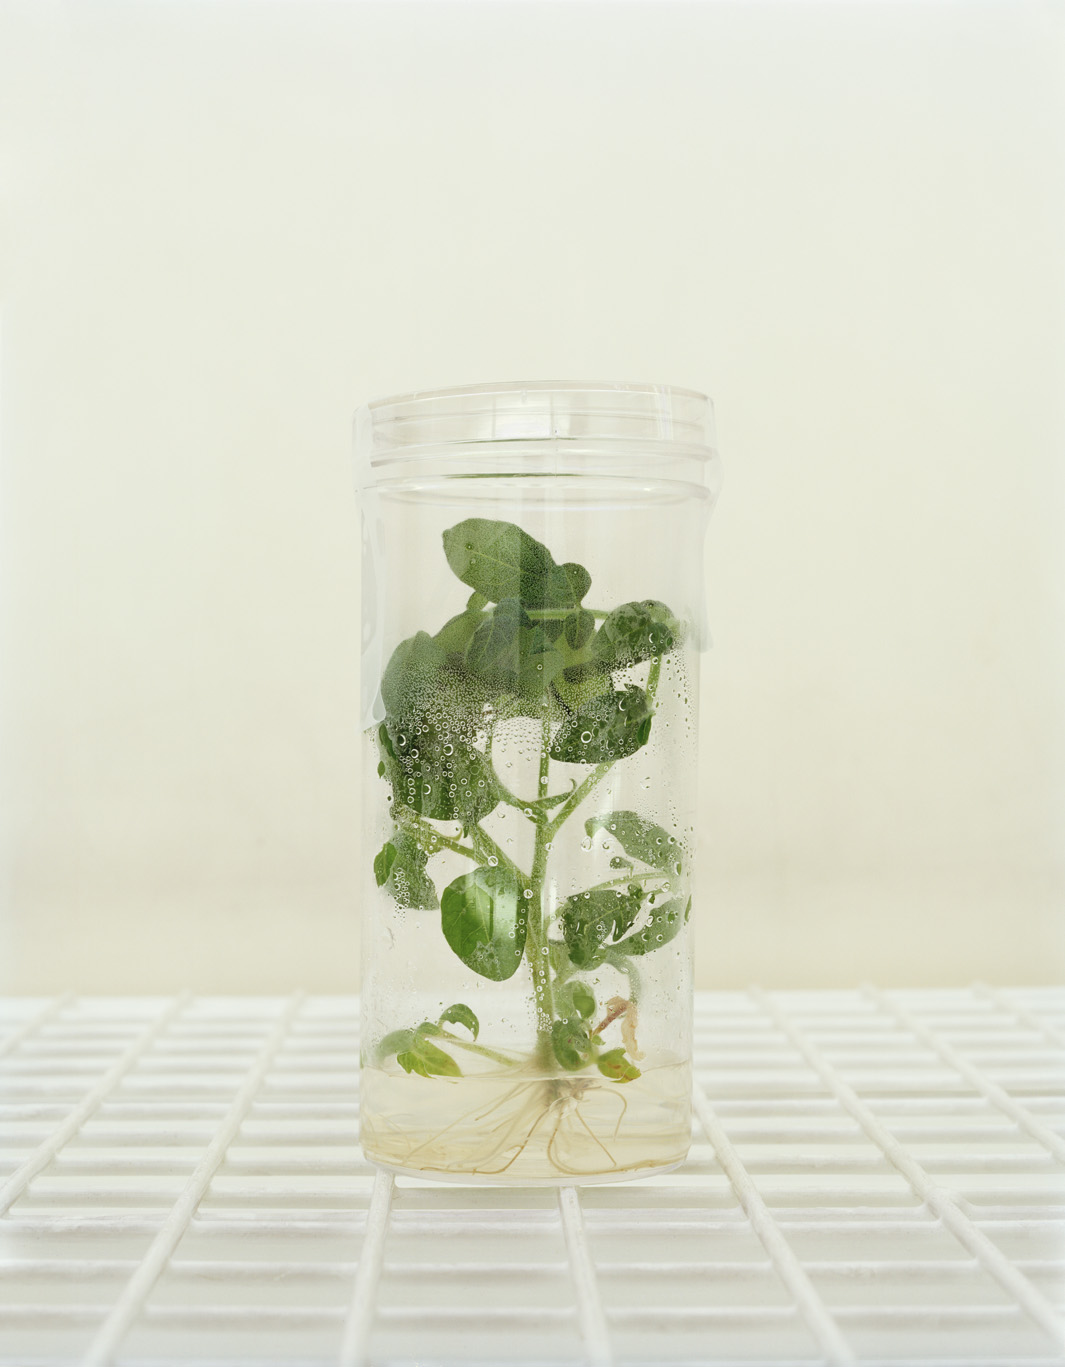 GM tomato plant.